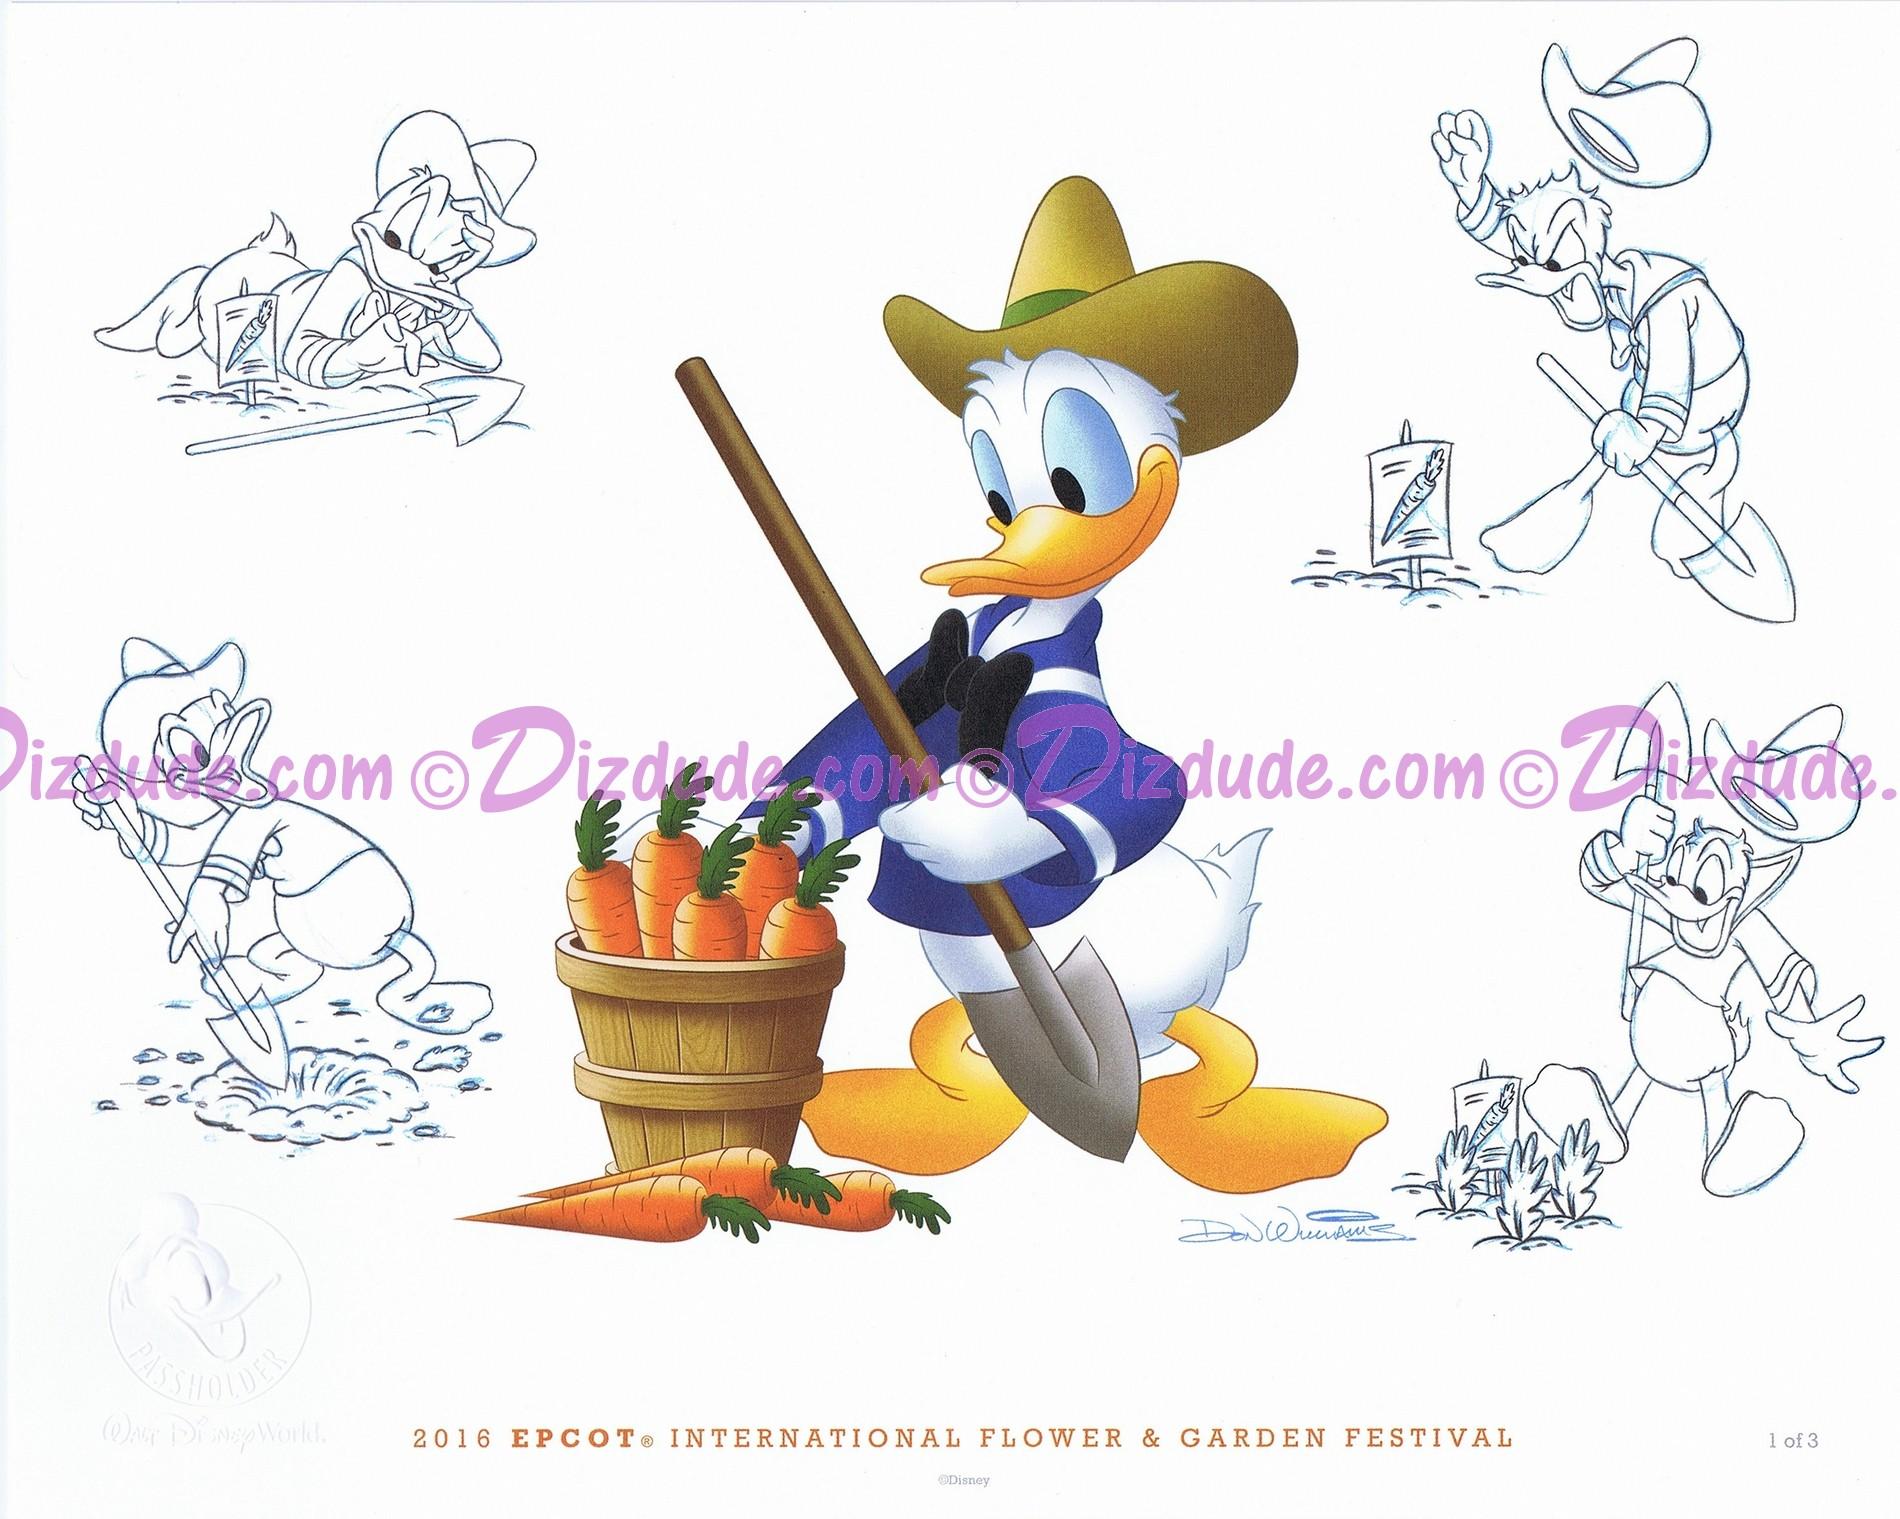 "Donald Passholder Lithograph Poster by famous Disney Artist Don ""Ducky"" Williams (MARCH) - Disney Epcot International Flower & Garden Festival 2016 © Dizdude.com"